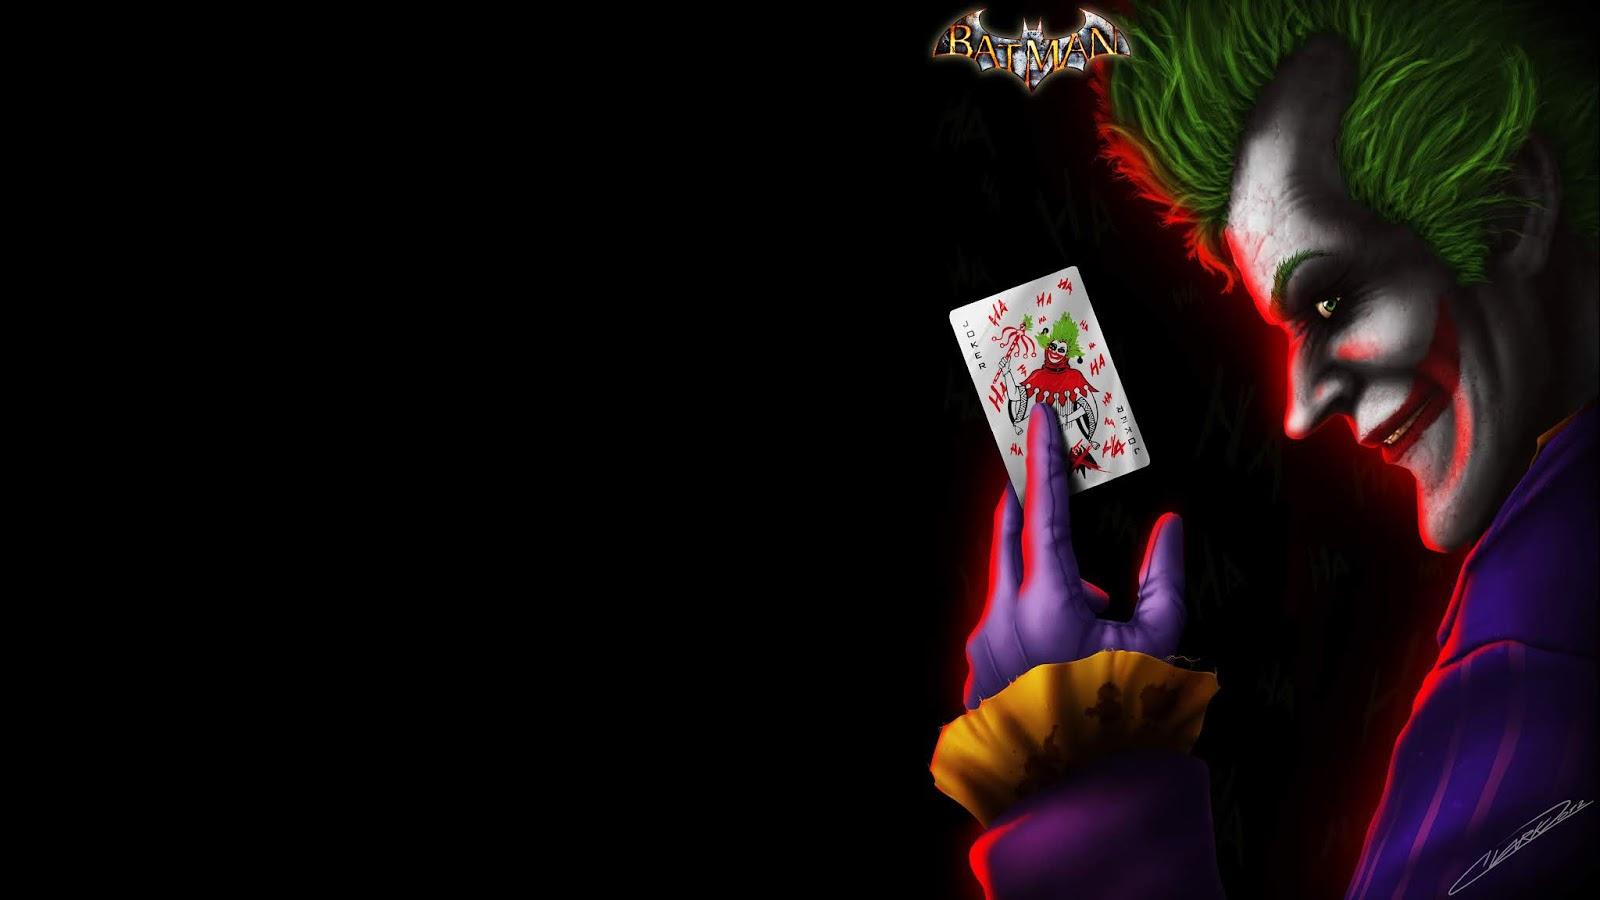 Wallpapers Joker Hd Fantastic Wallpaper Iphone